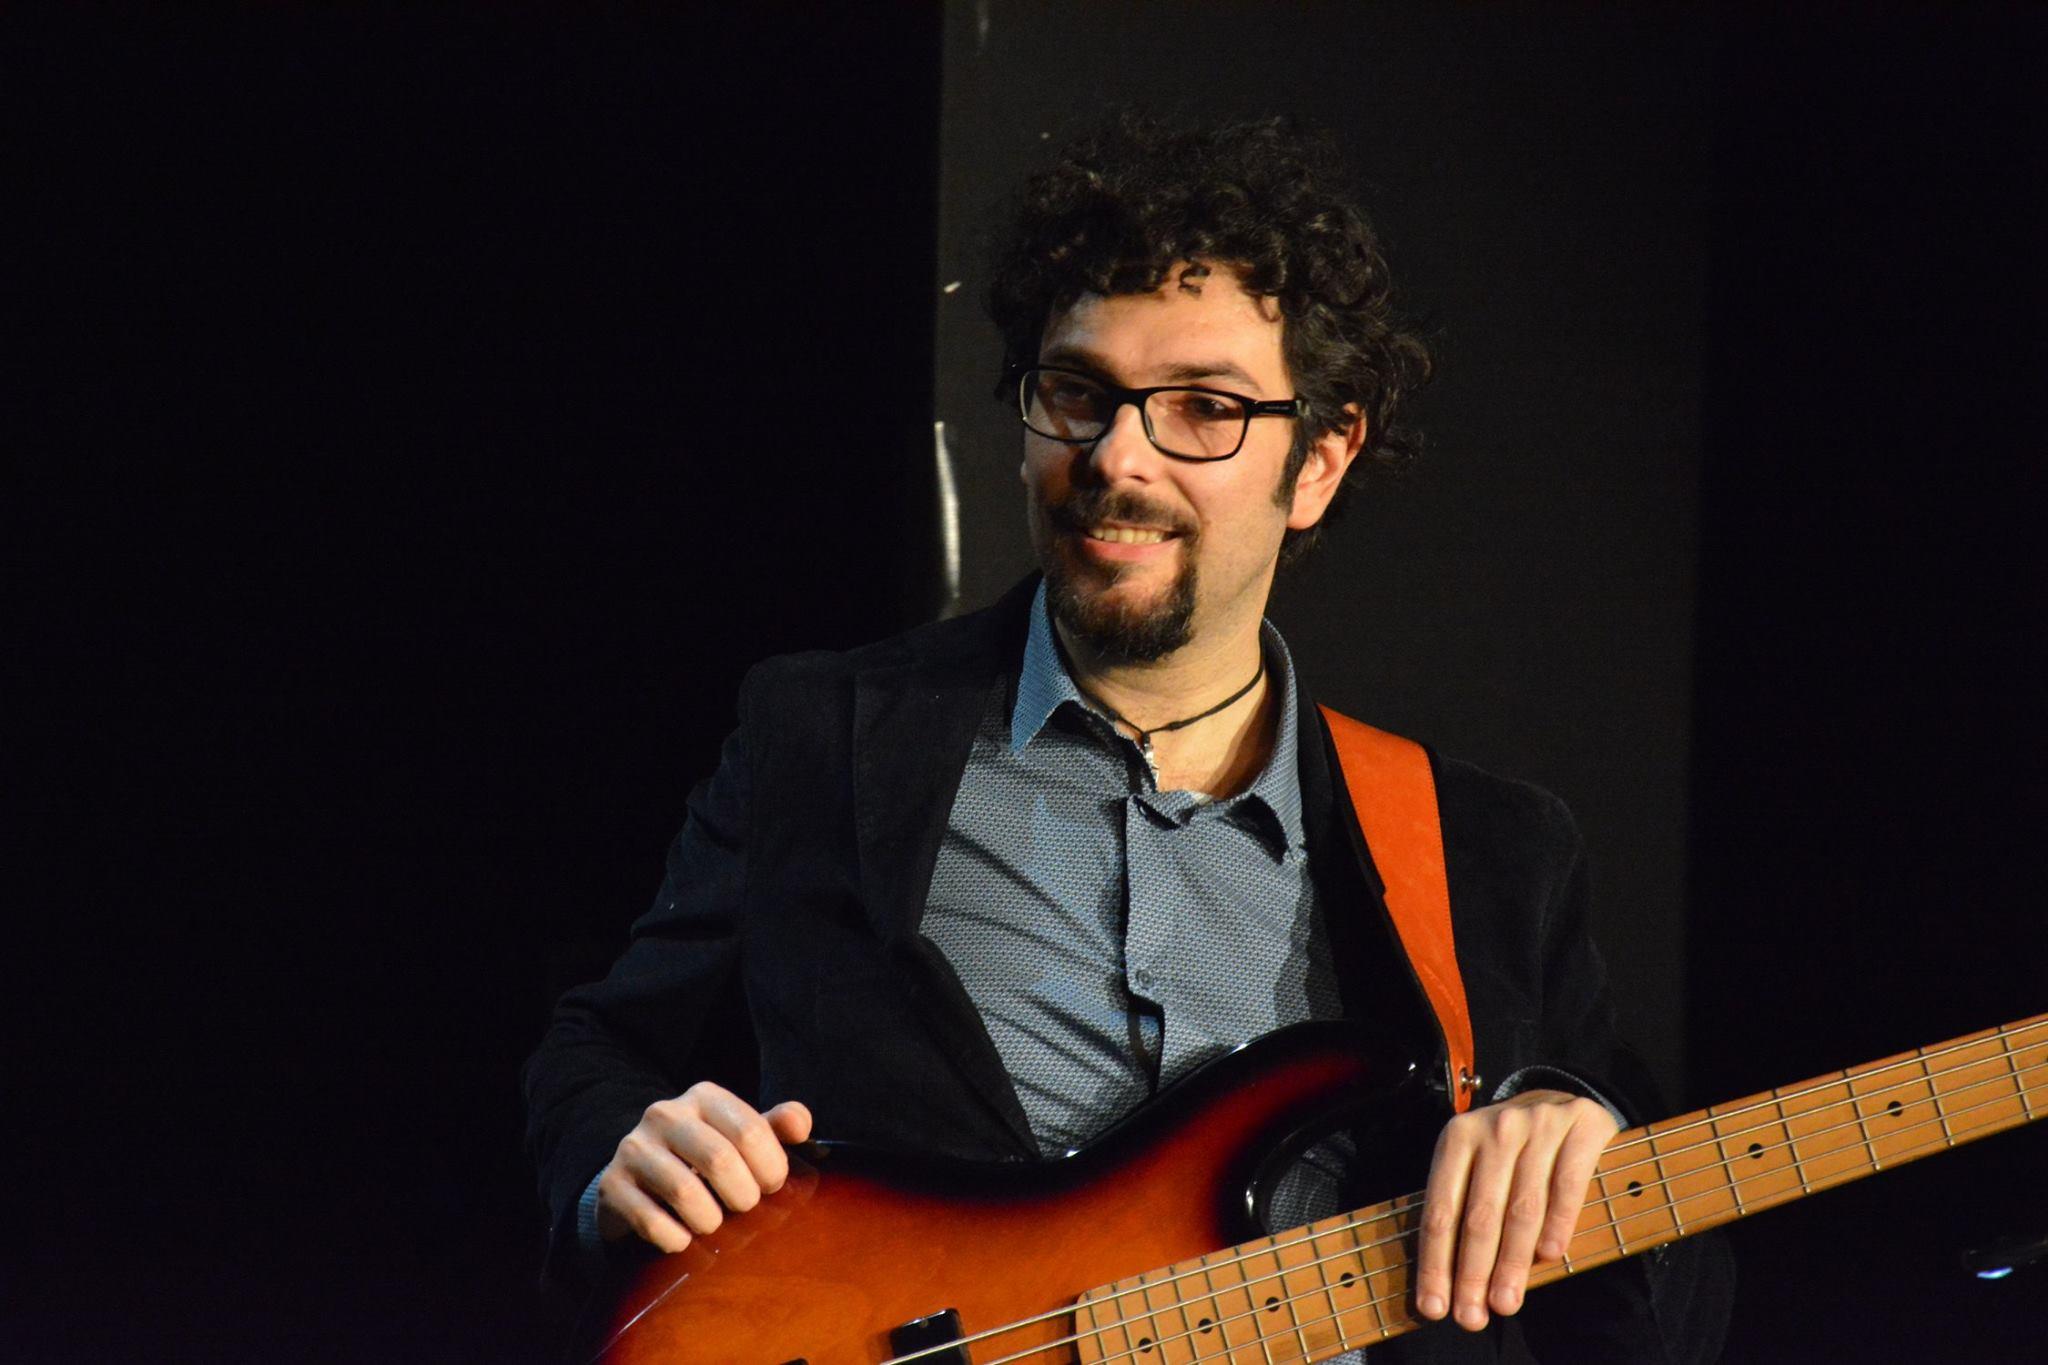 Daniele Pinceti